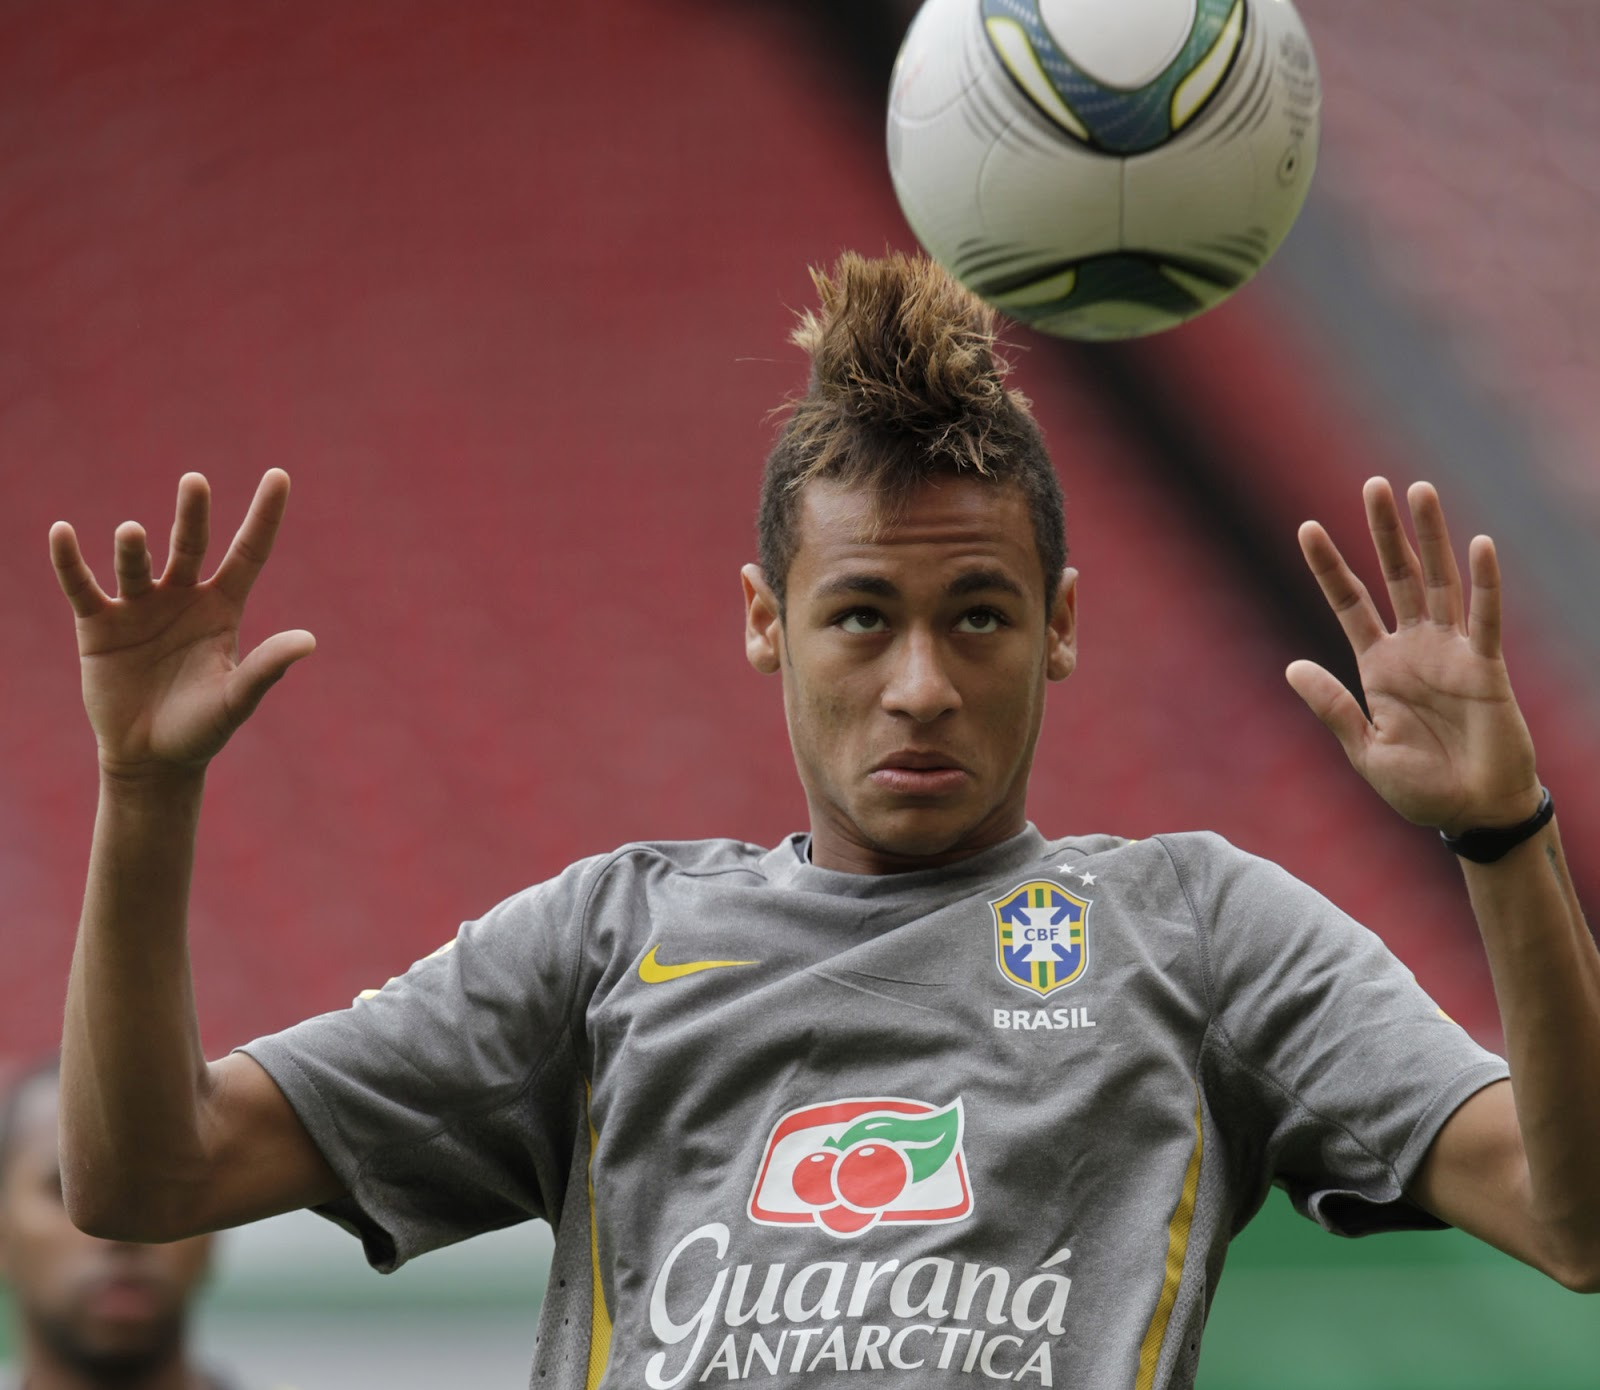 http://2.bp.blogspot.com/-H-0BGMg2r9Y/UEFvOniTuNI/AAAAAAAAF1M/I3NumpgogZs/s1600/Neymar+Training+Schedule.jpg